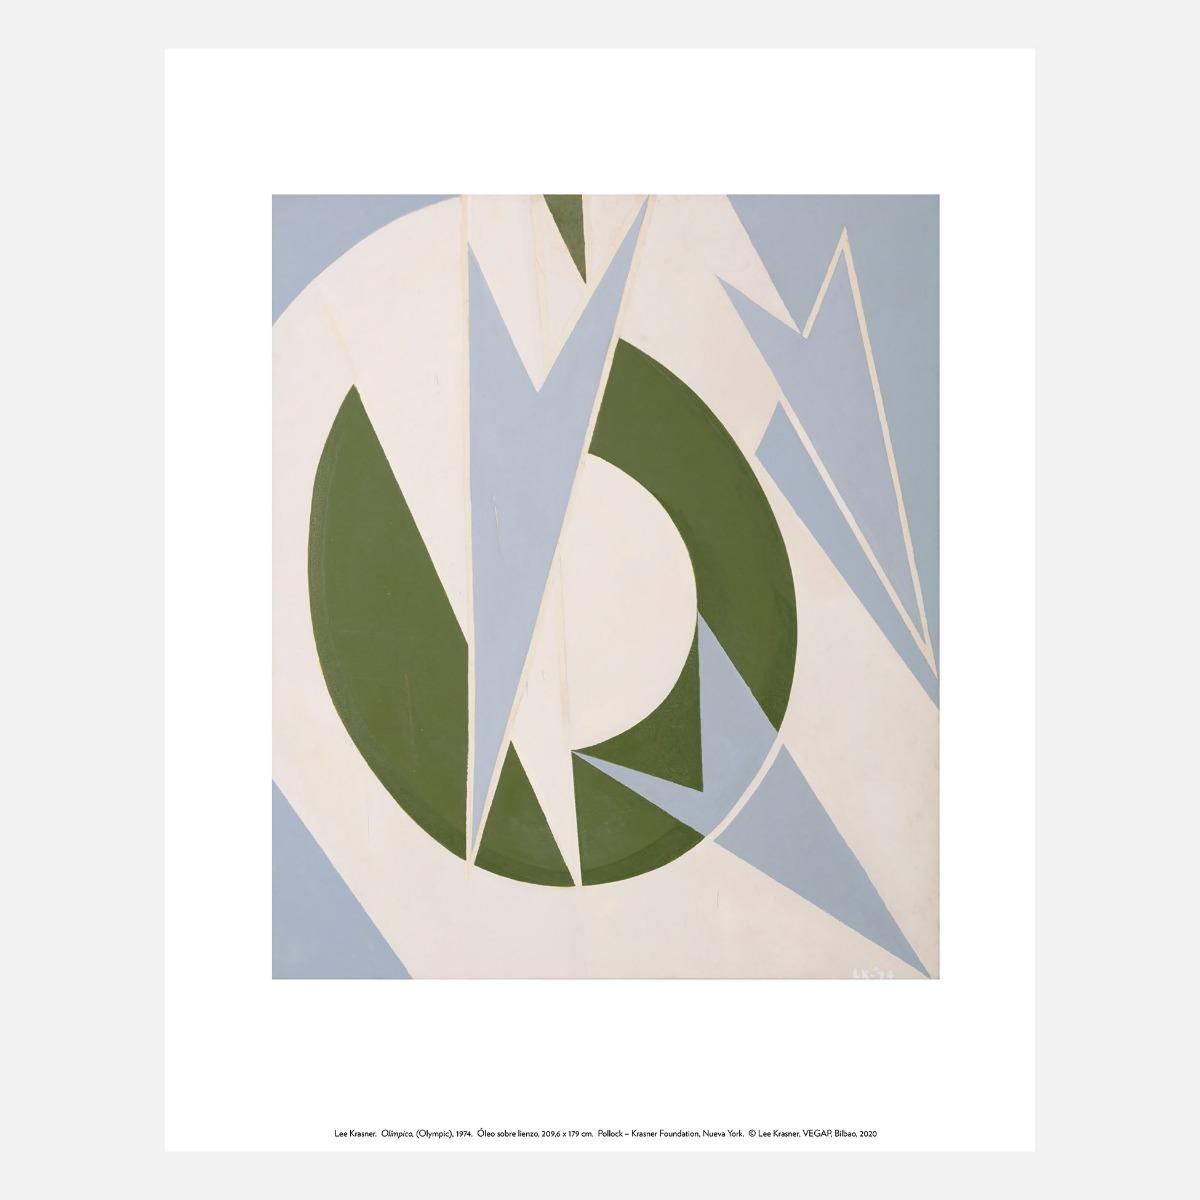 Olimpic print, 1974